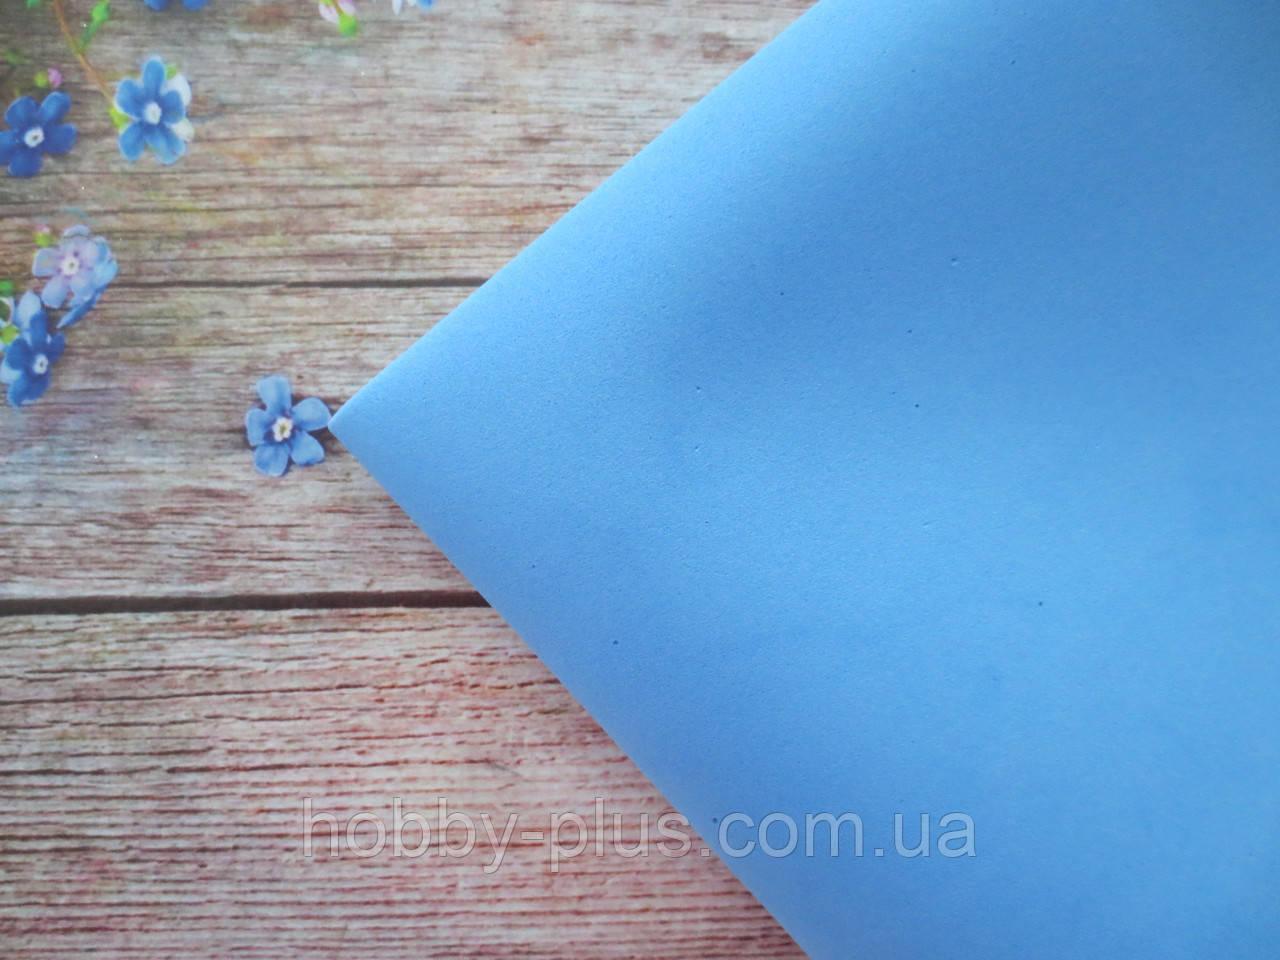 Фоамиран 1 мм, 50х50 см, цвет ТЕМНО-ГОЛУБОЙ